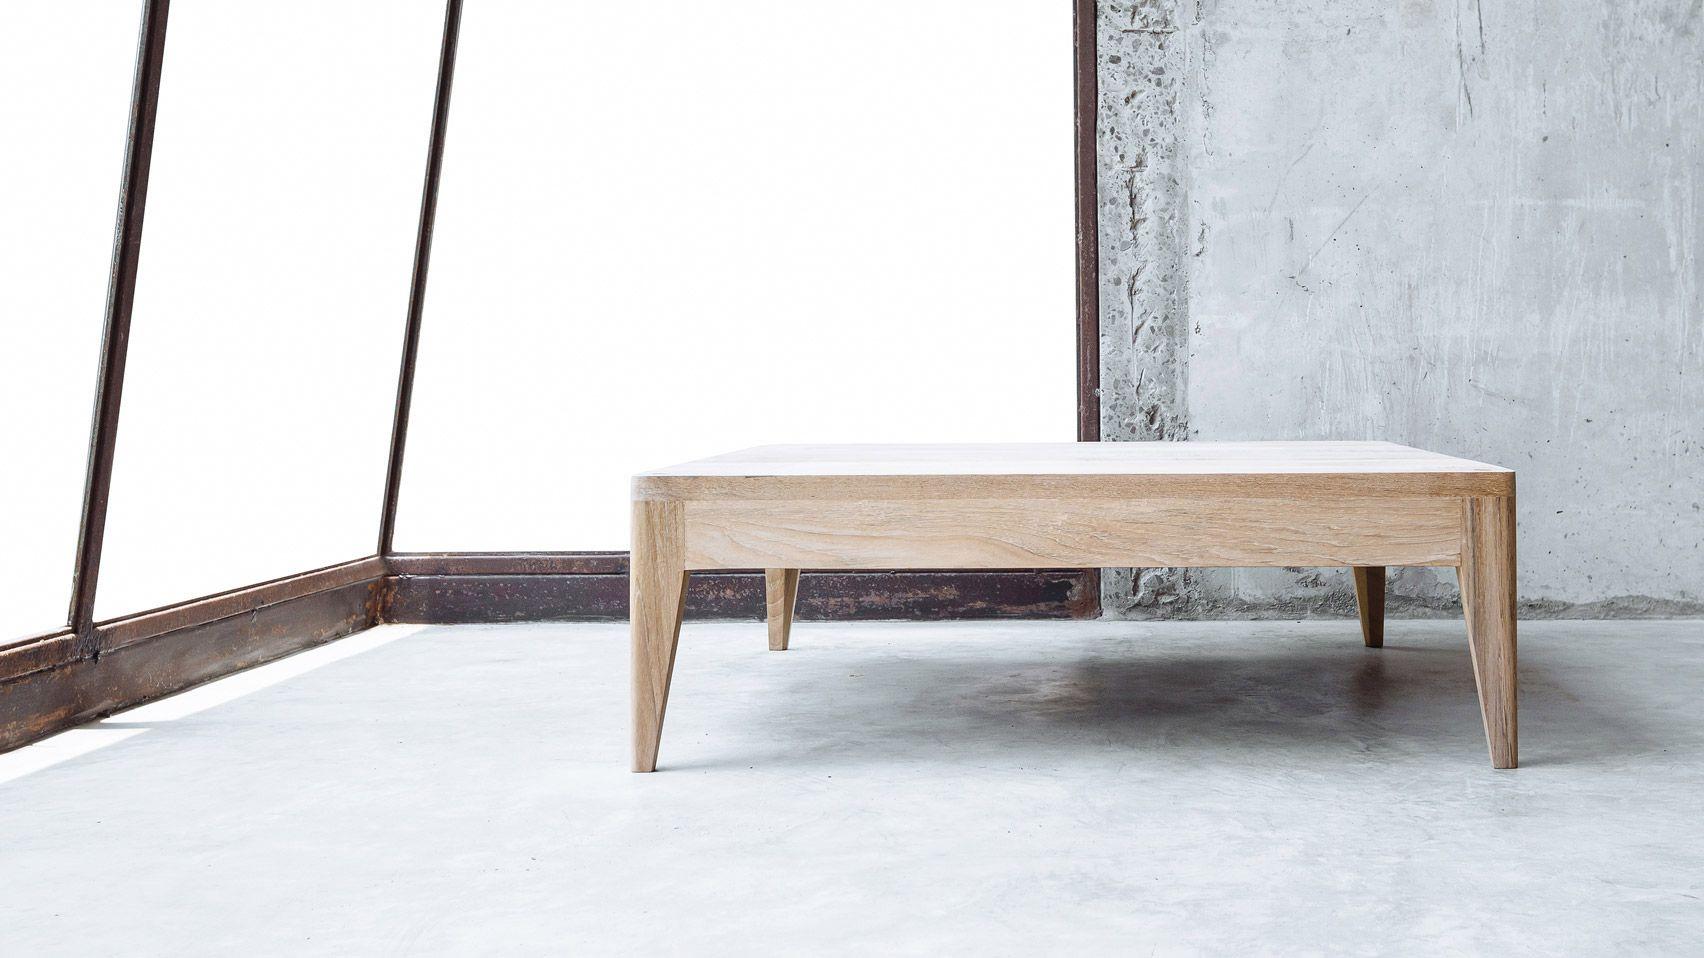 L06 Wooden Coffee Table By Studio Eva Natasa In 2020 Wooden Coffee Table Coffee Table Table And Chairs [ 958 x 1704 Pixel ]